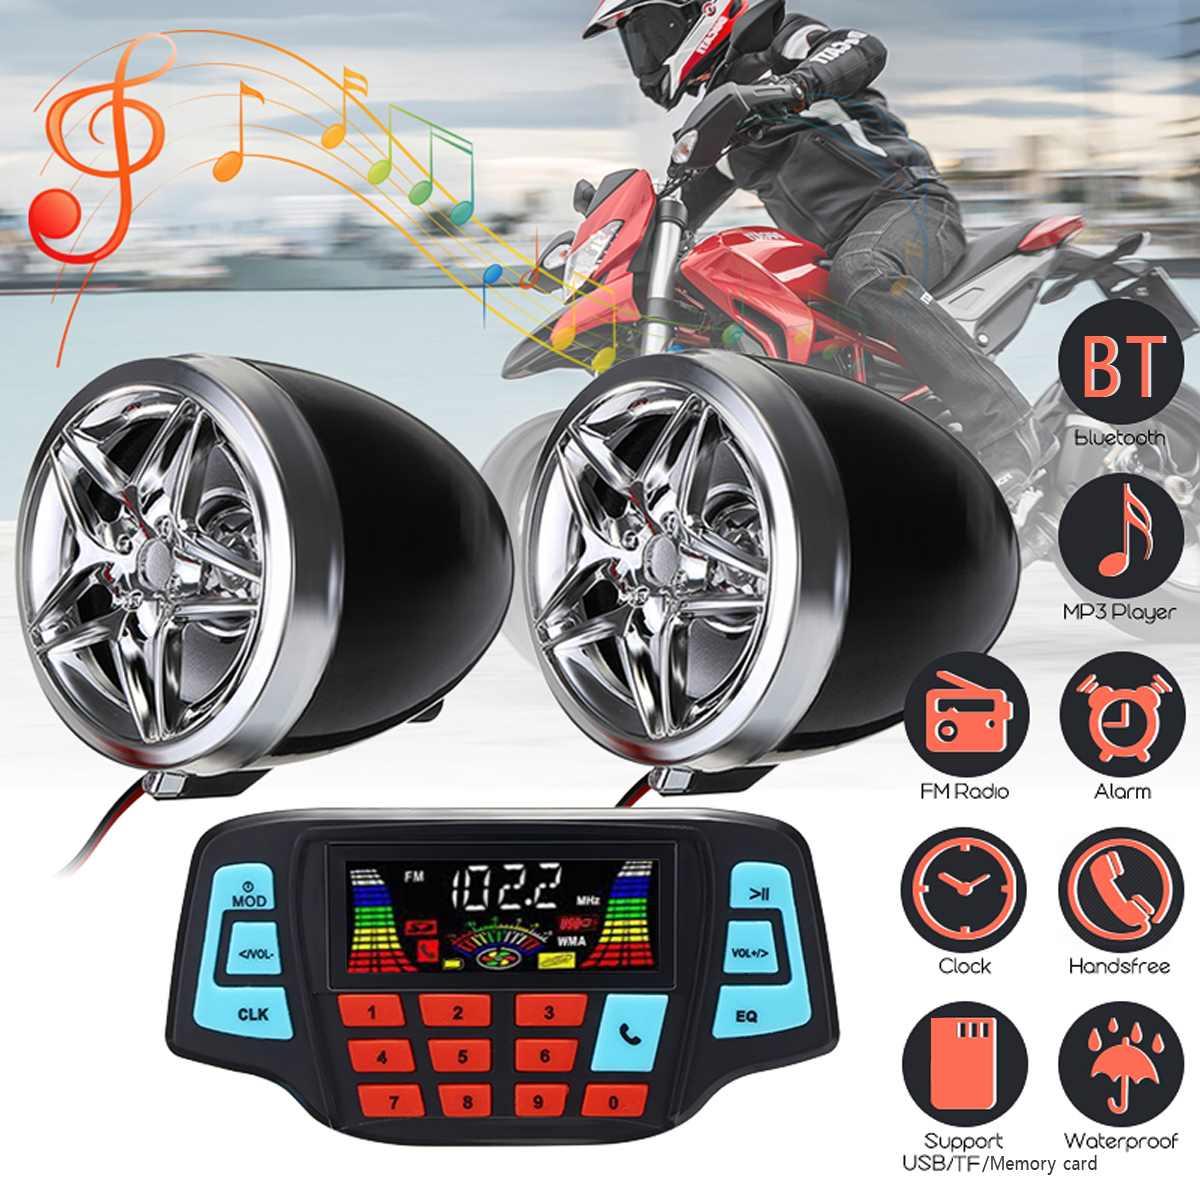 Mofaner 12V Waterproof Motorcycle bluetooth Radio Motorbike ATV MP3 Player Two Speaker Handlebar Radio For Honda For Kawasaki